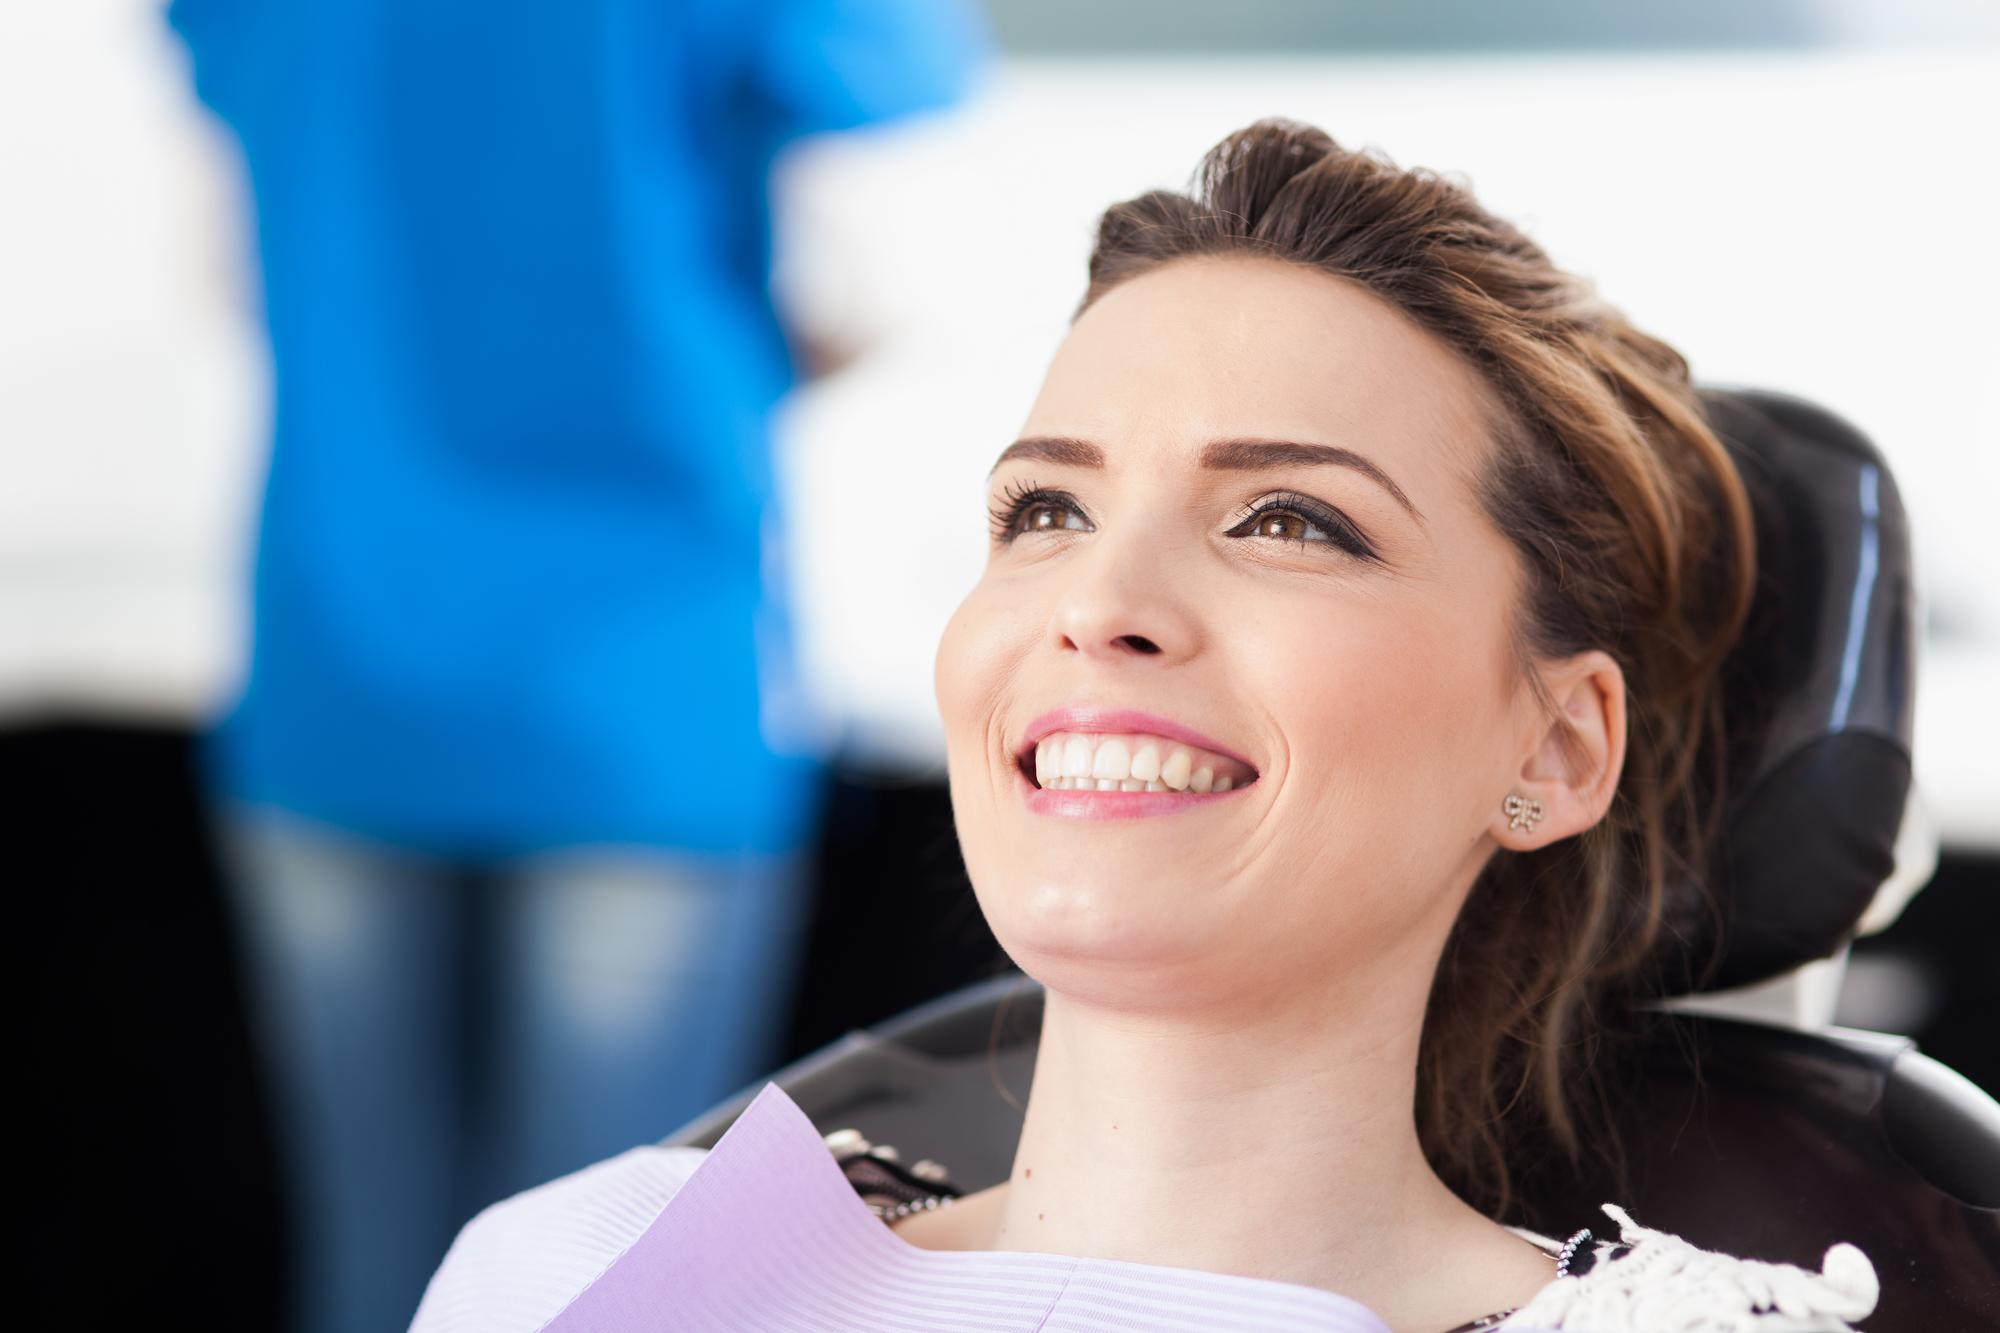 Ceramic Dental Implants Jupiter FL | Why Ceramic Dental Implants are a Better Choice